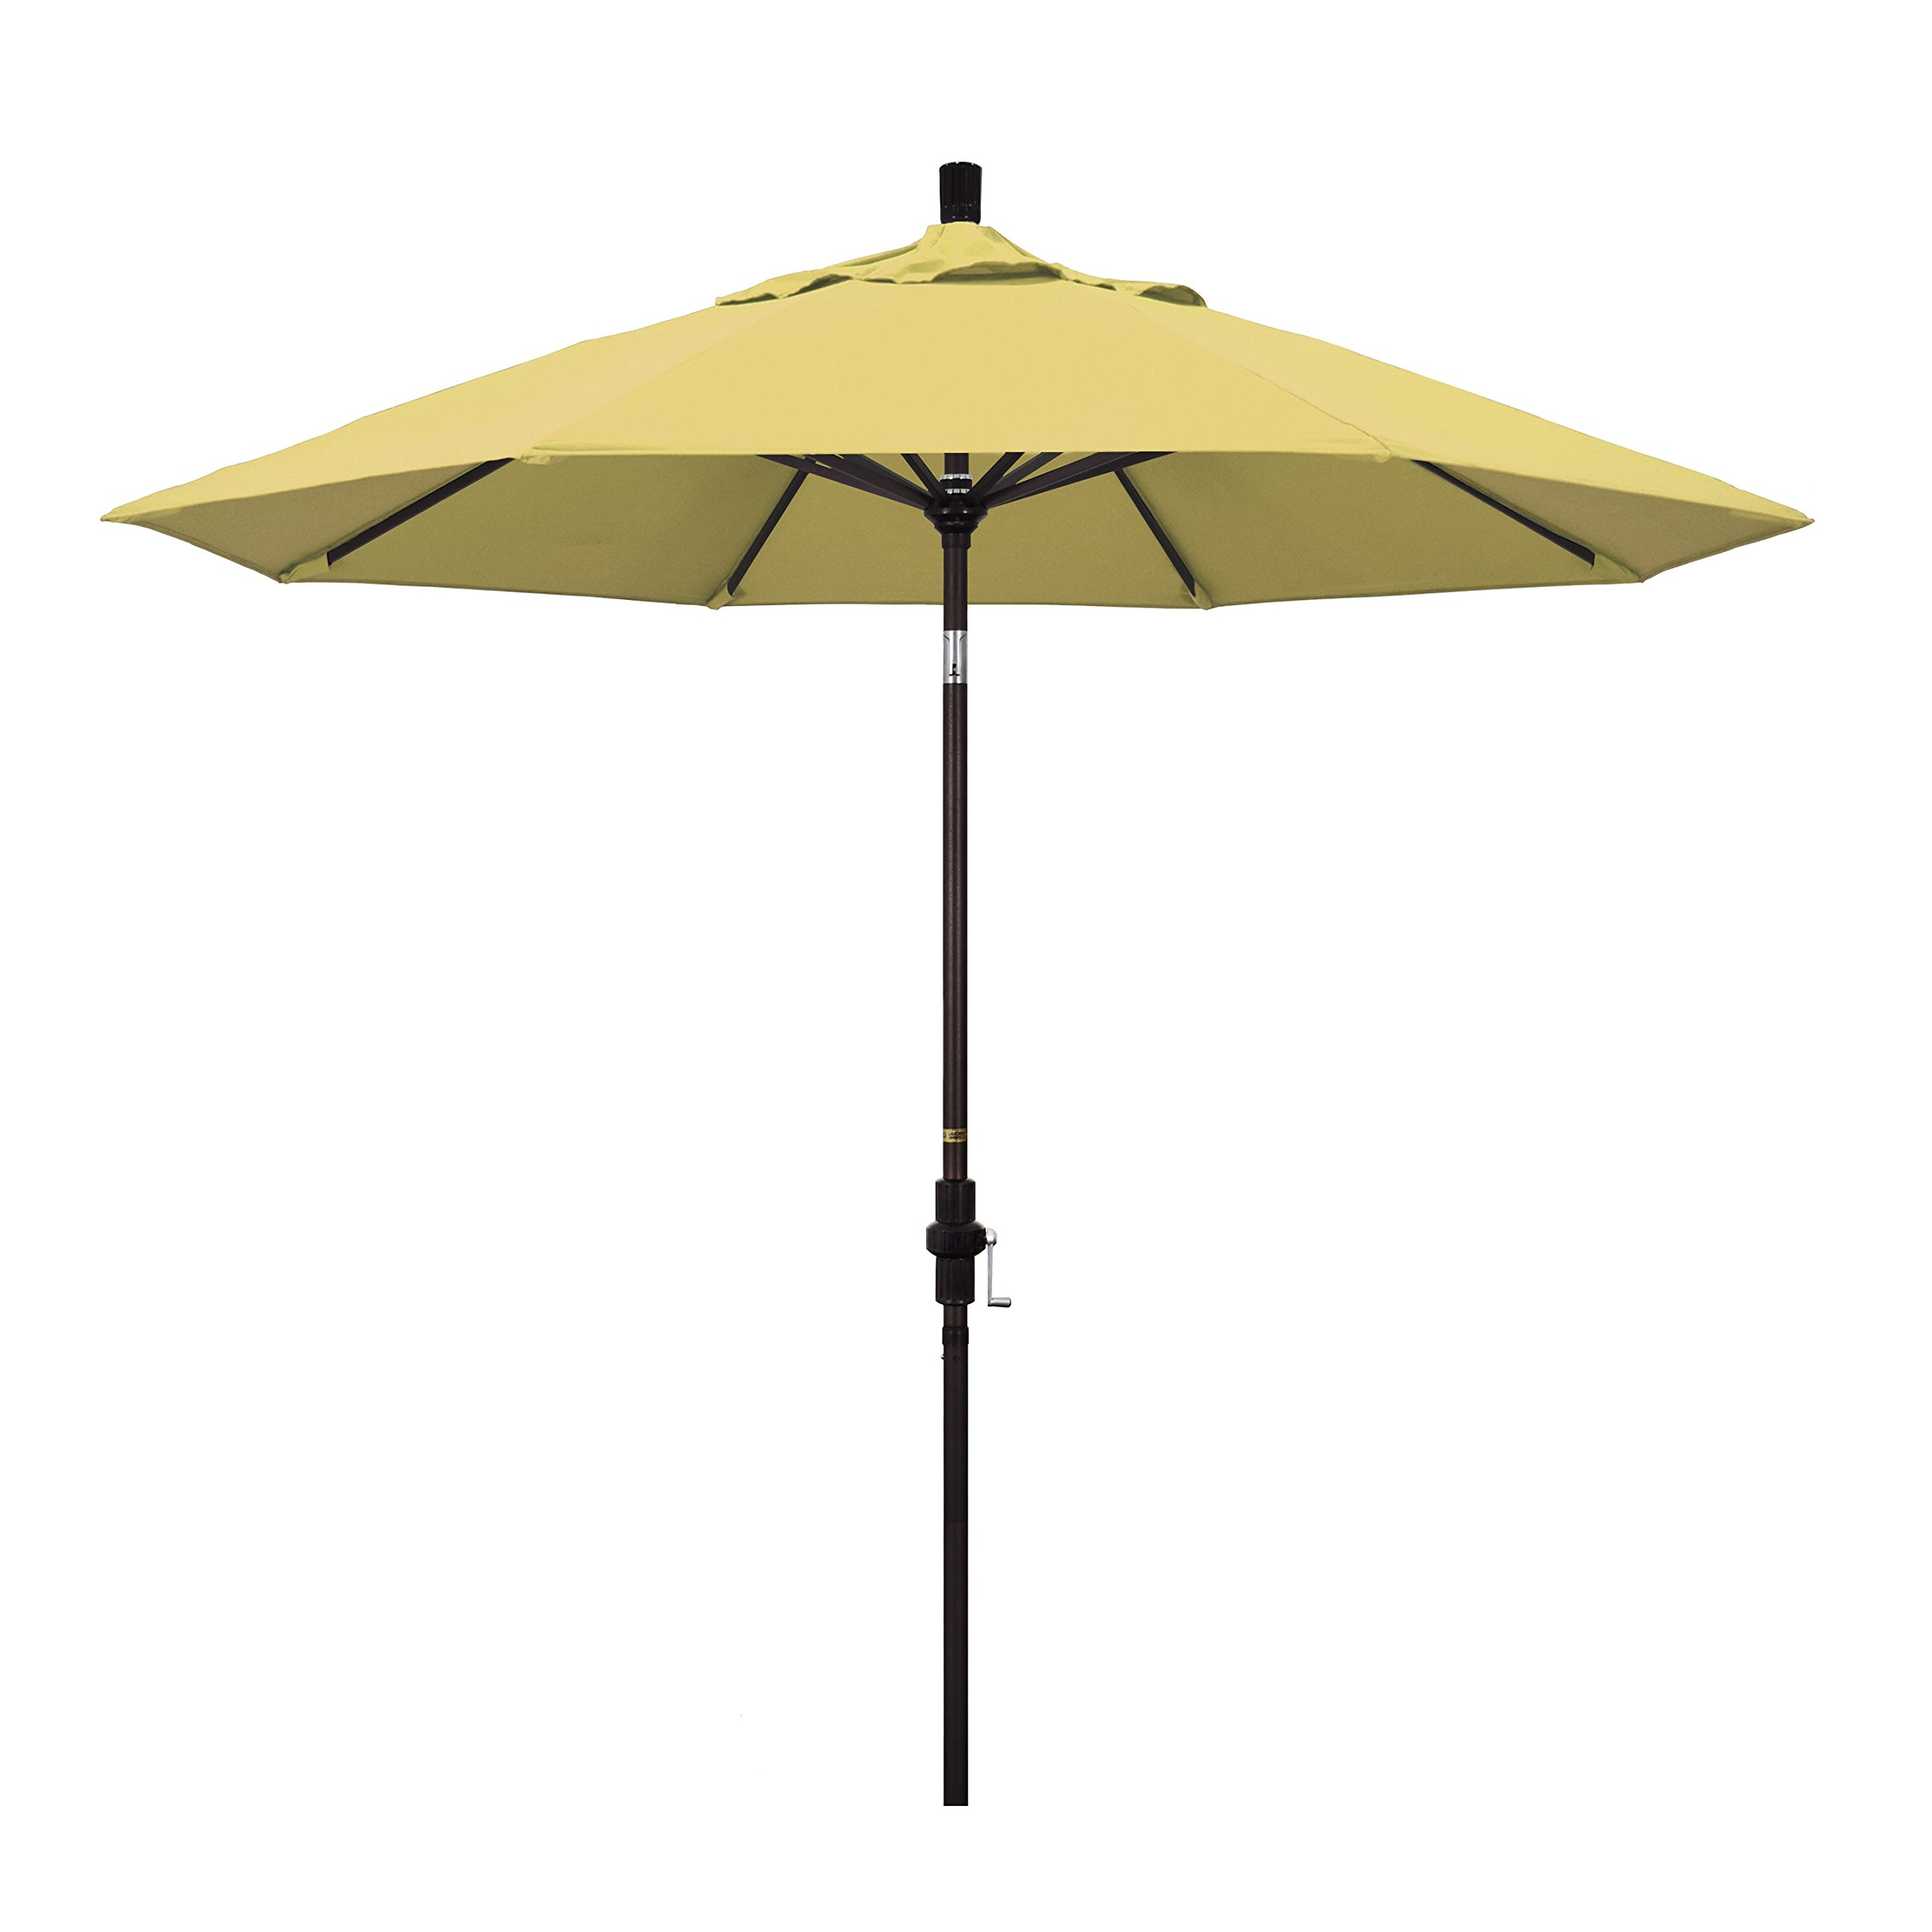 California Umbrella 9' Round Aluminum Market Umbrella, Crank Lift, Collar Tilt, Bronze Pole, Sunbrella Wheat